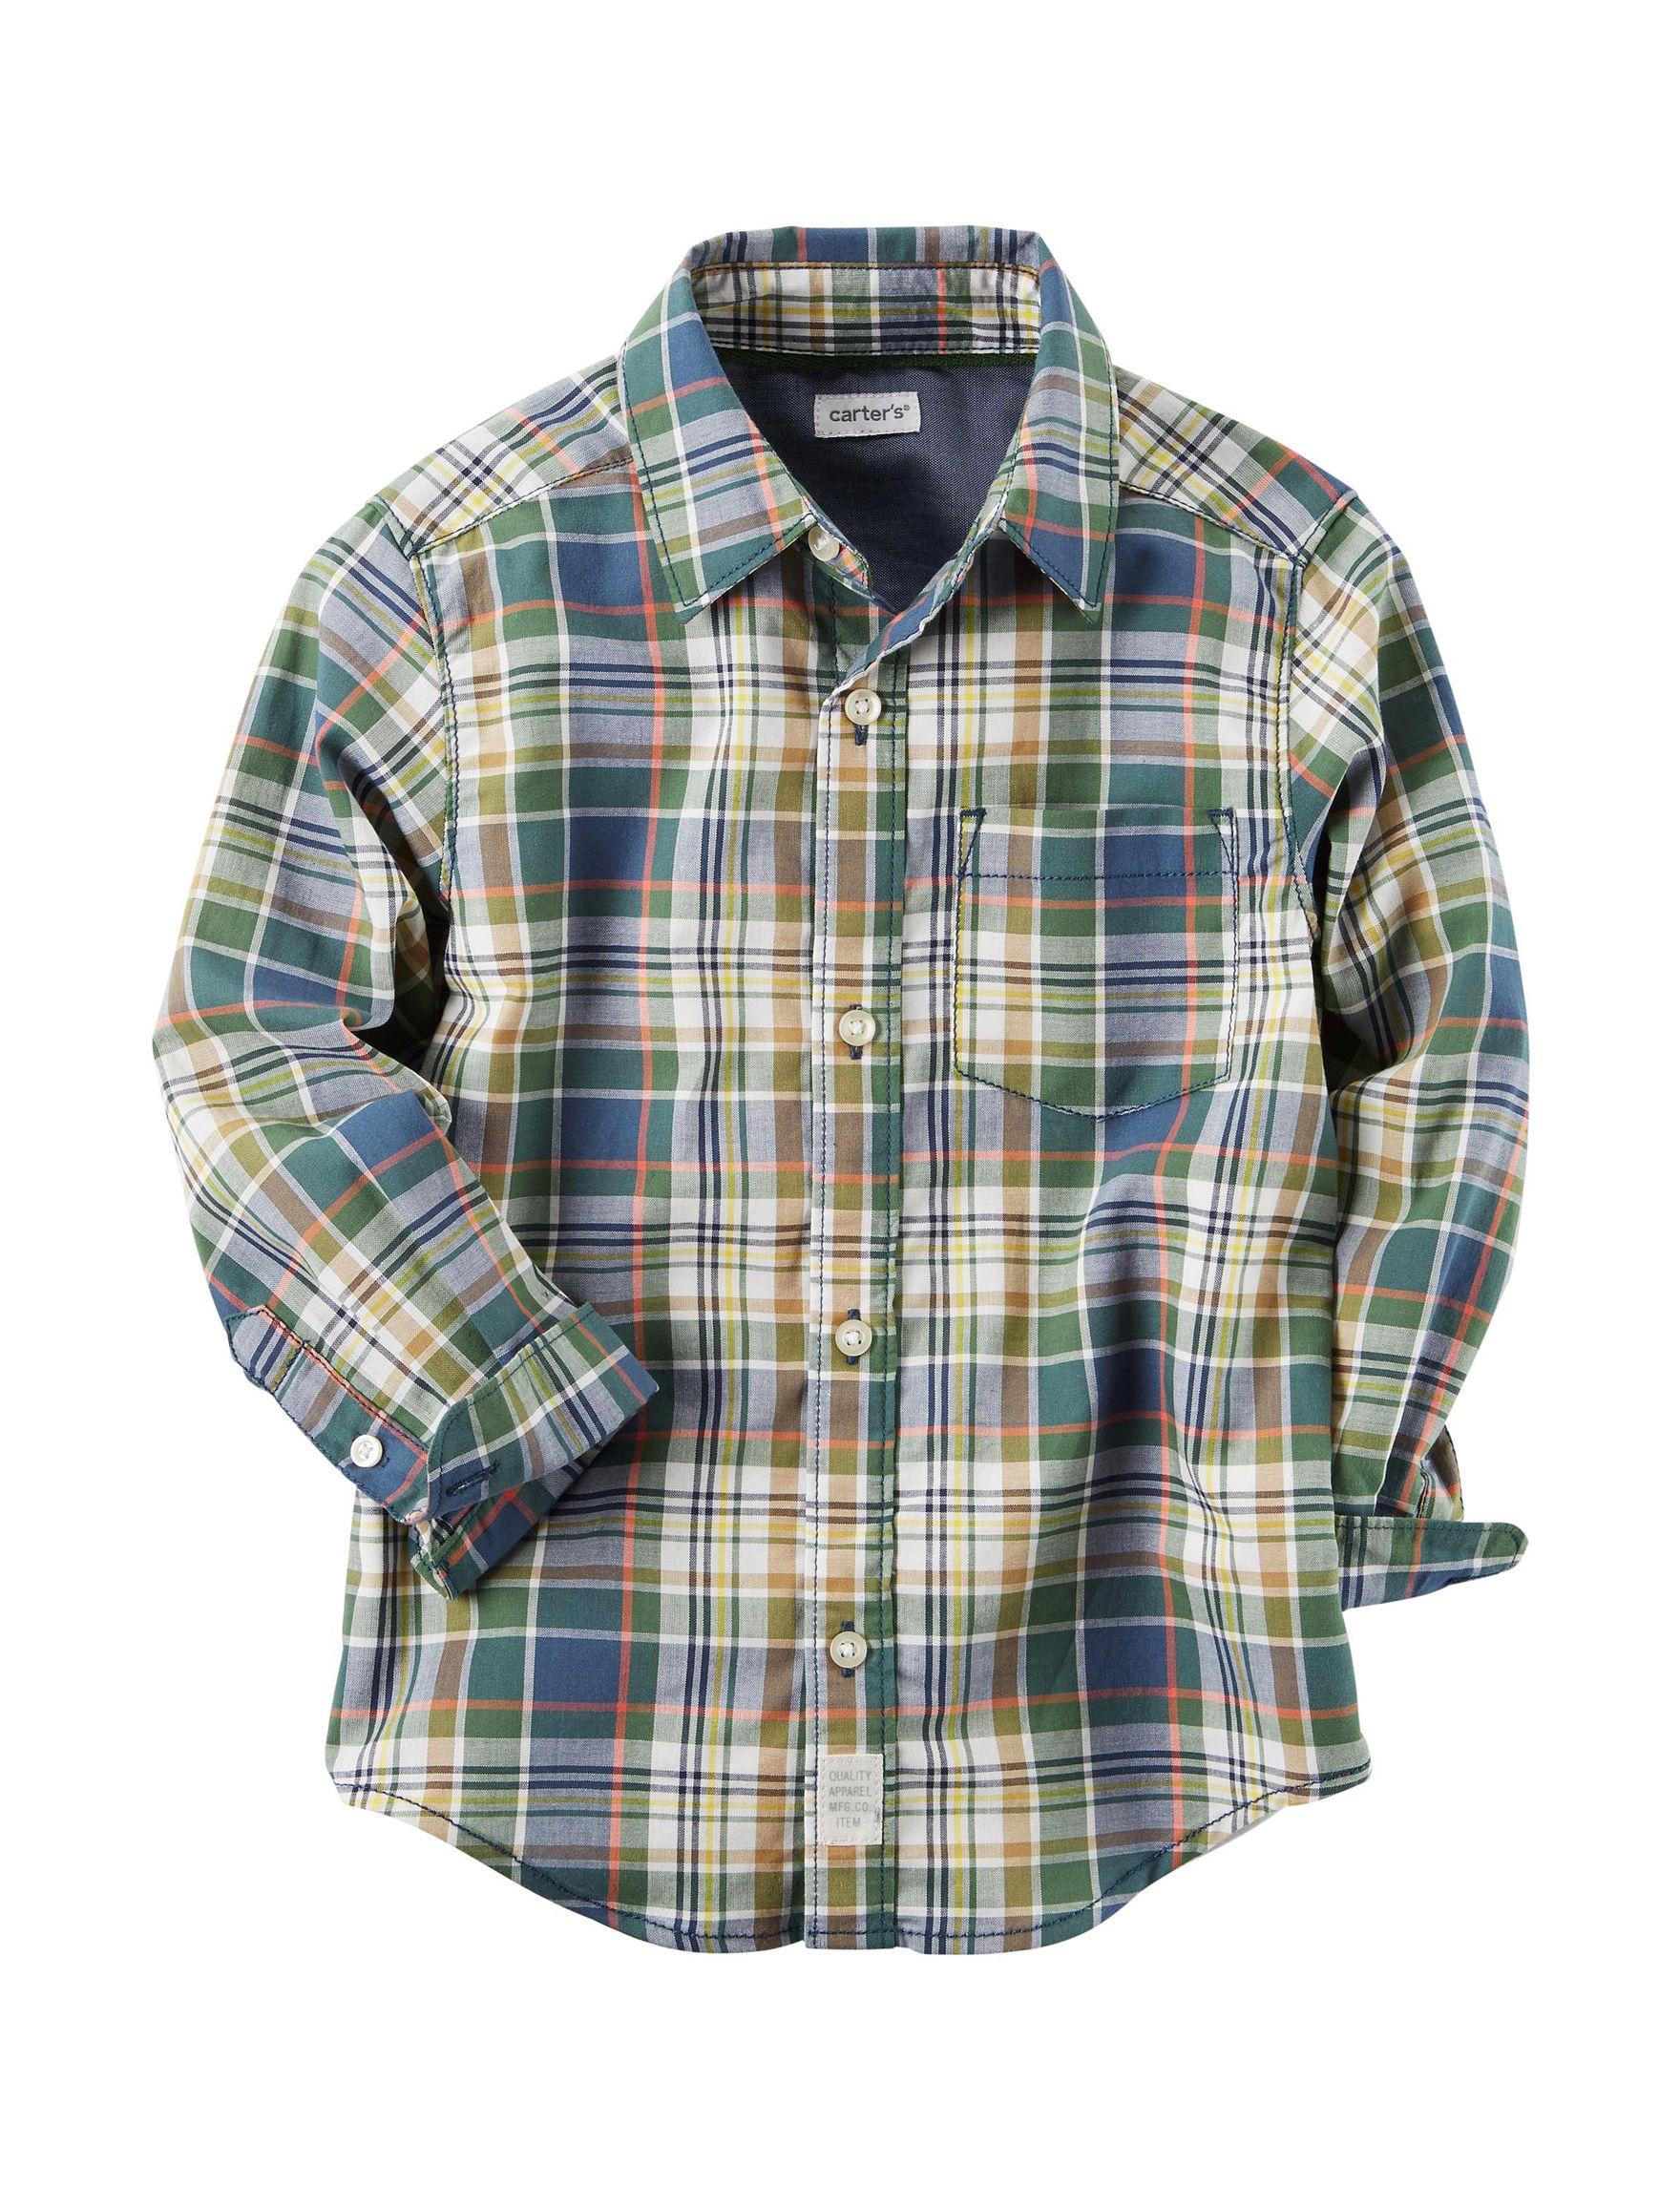 Carter's Plaid Casual Button Down Shirts